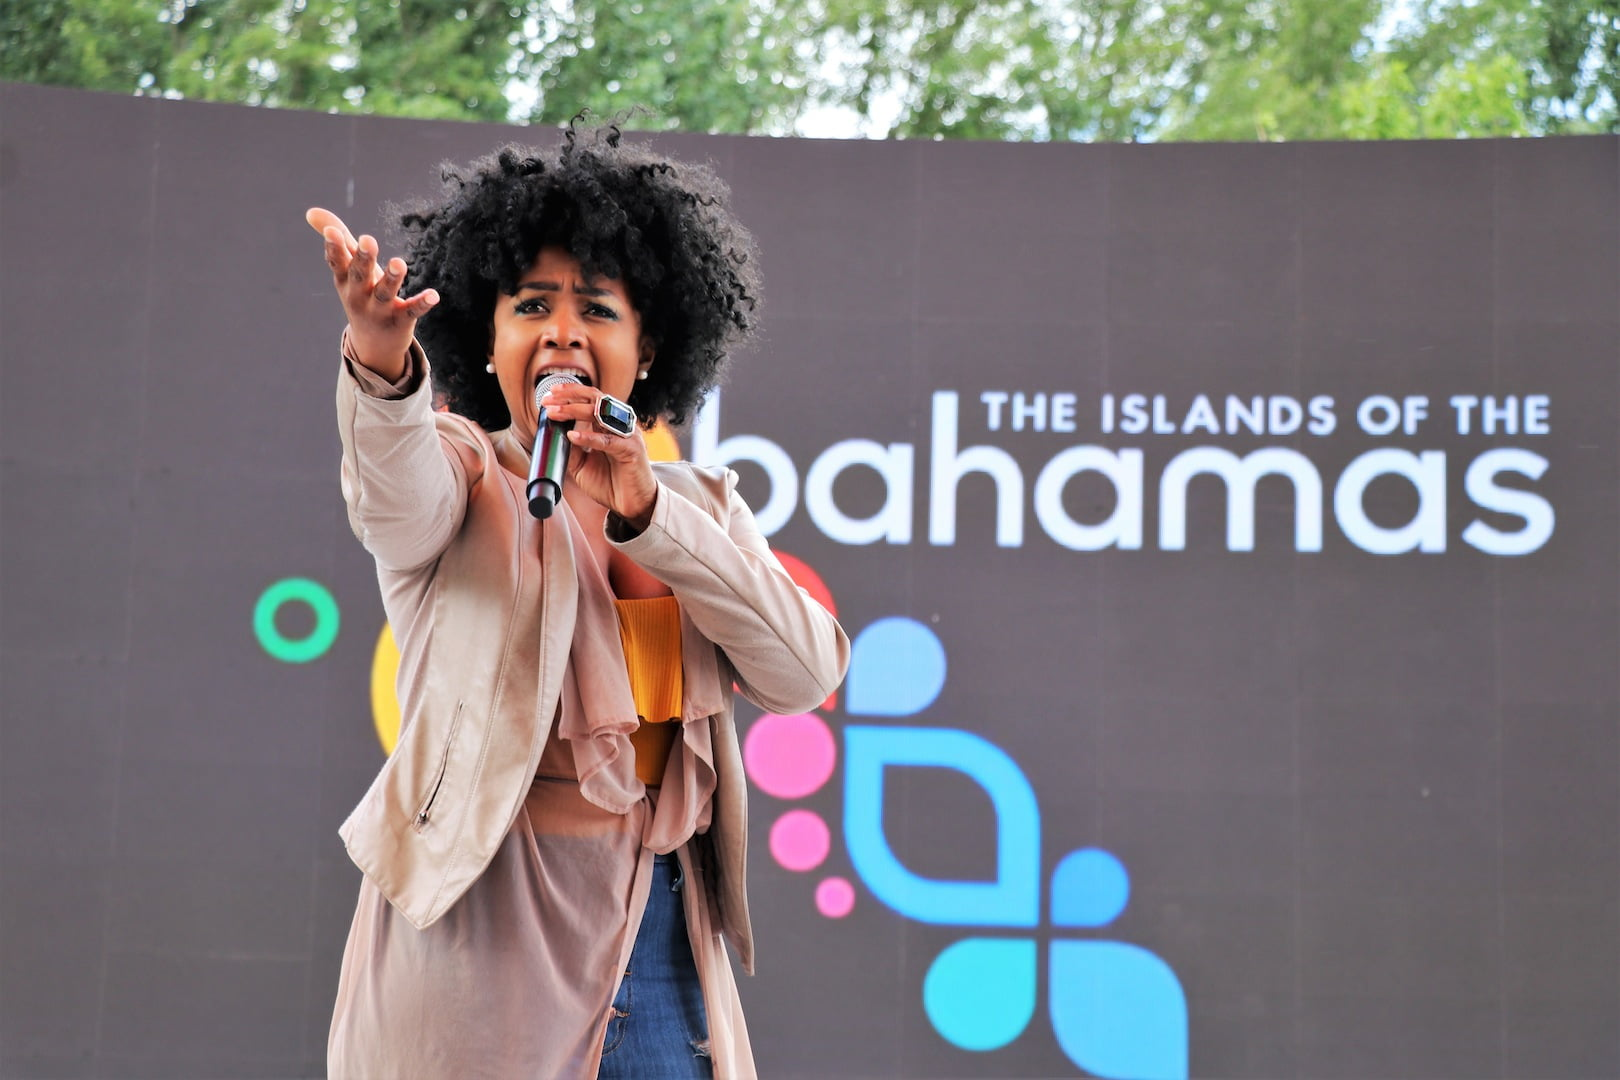 Bahamian Vocalists Shine at Beijing Expo